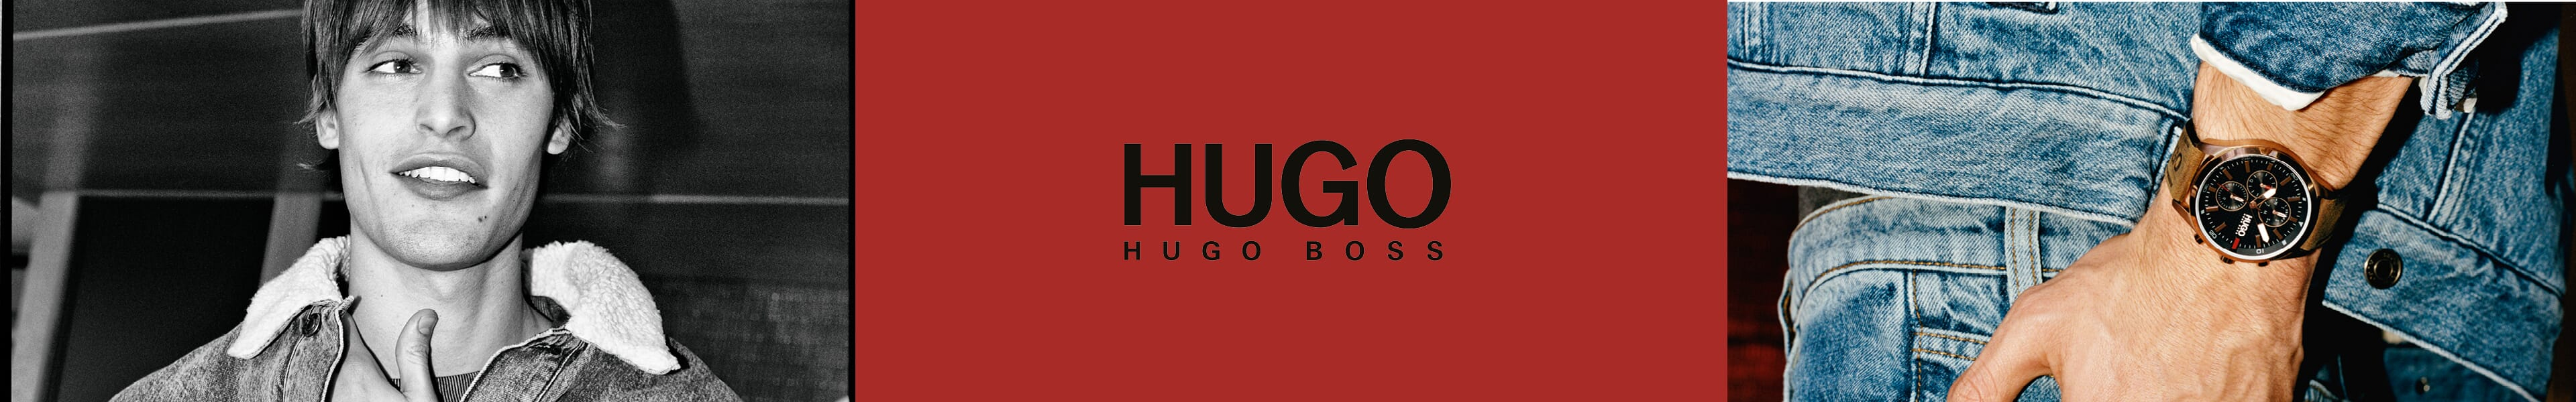 HUGO Watches